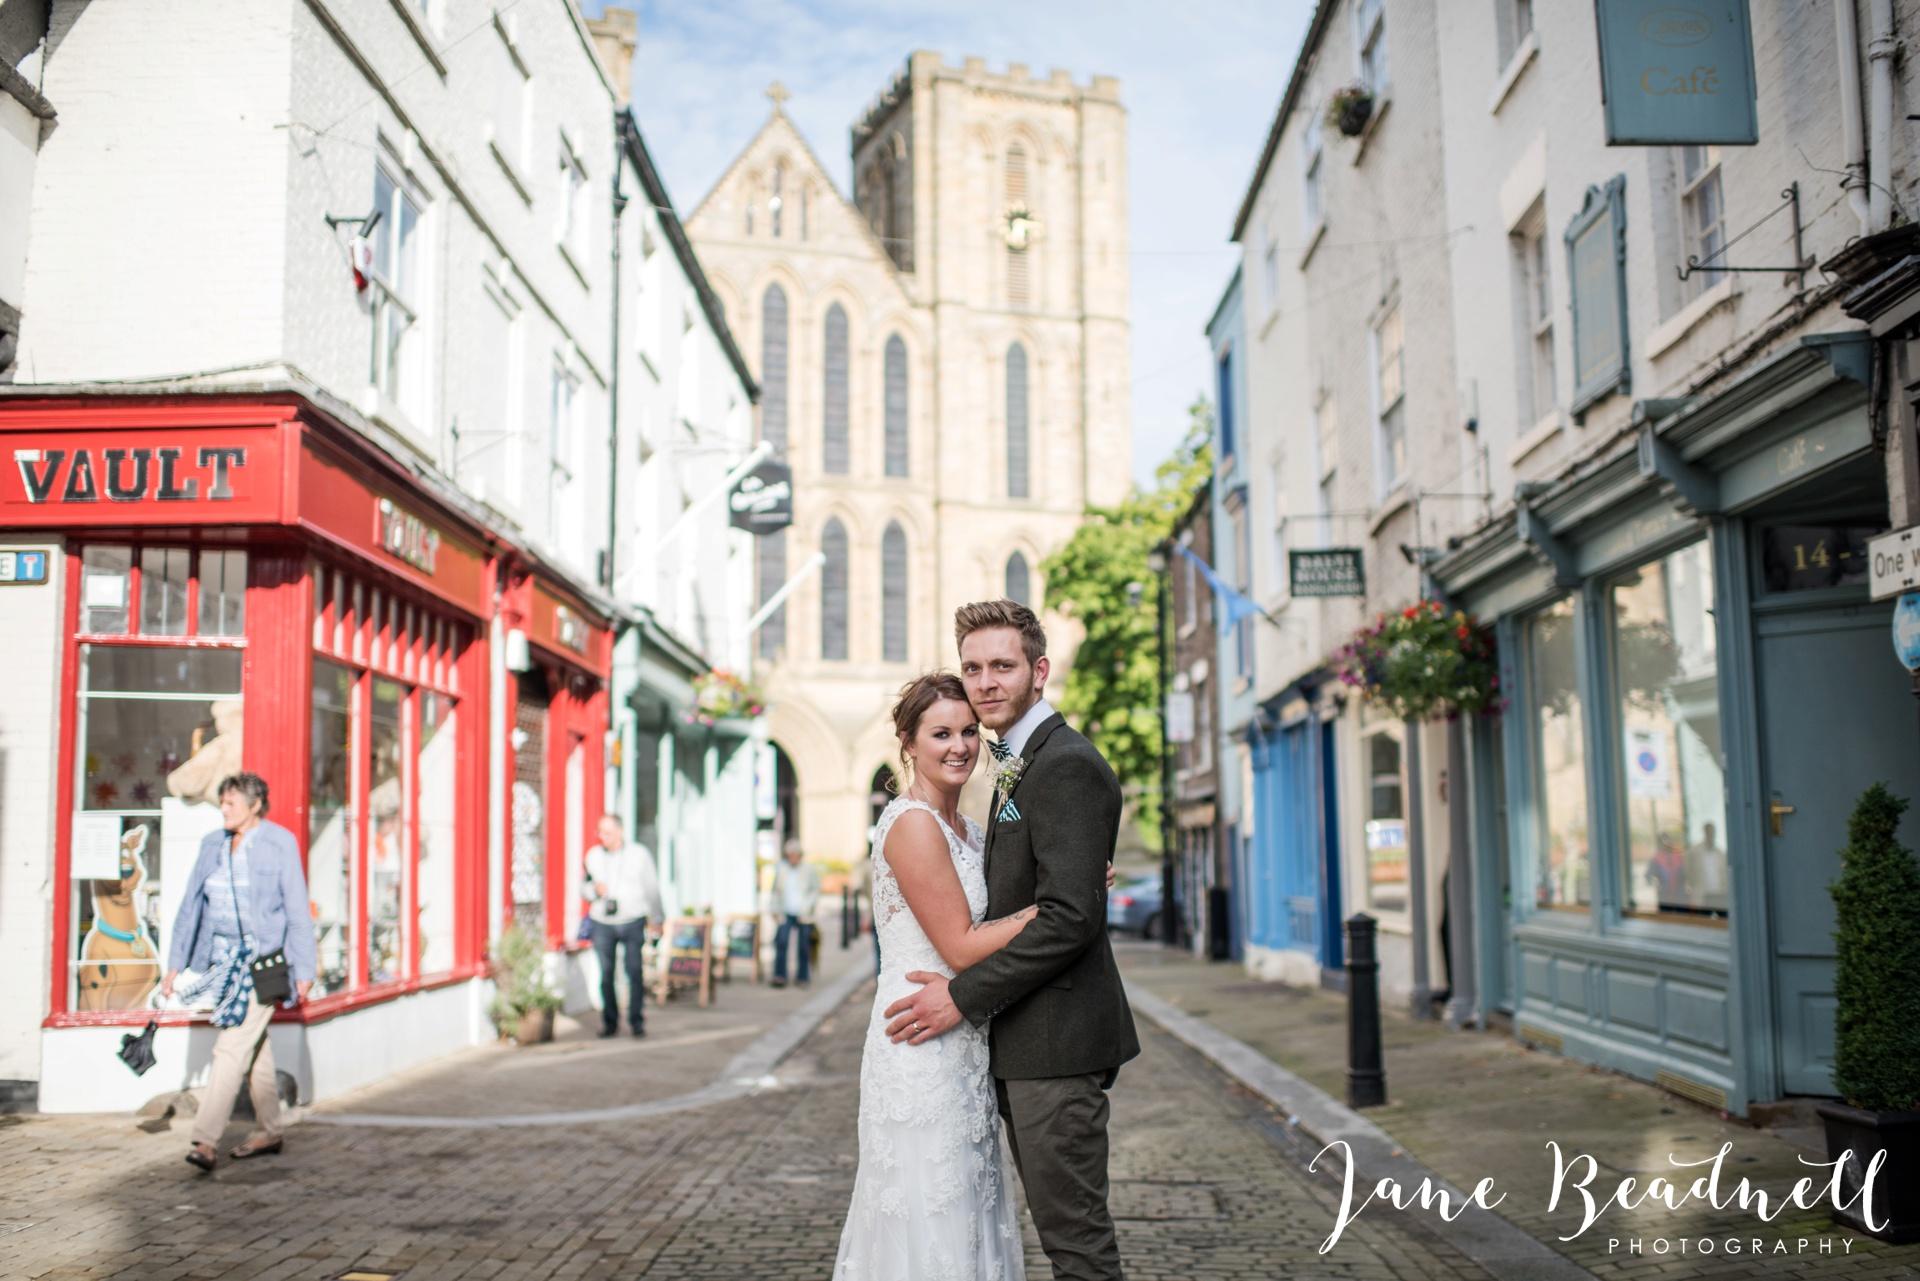 Jane Beadnell fine art wedding photographer The Old Deanery Ripon_0078